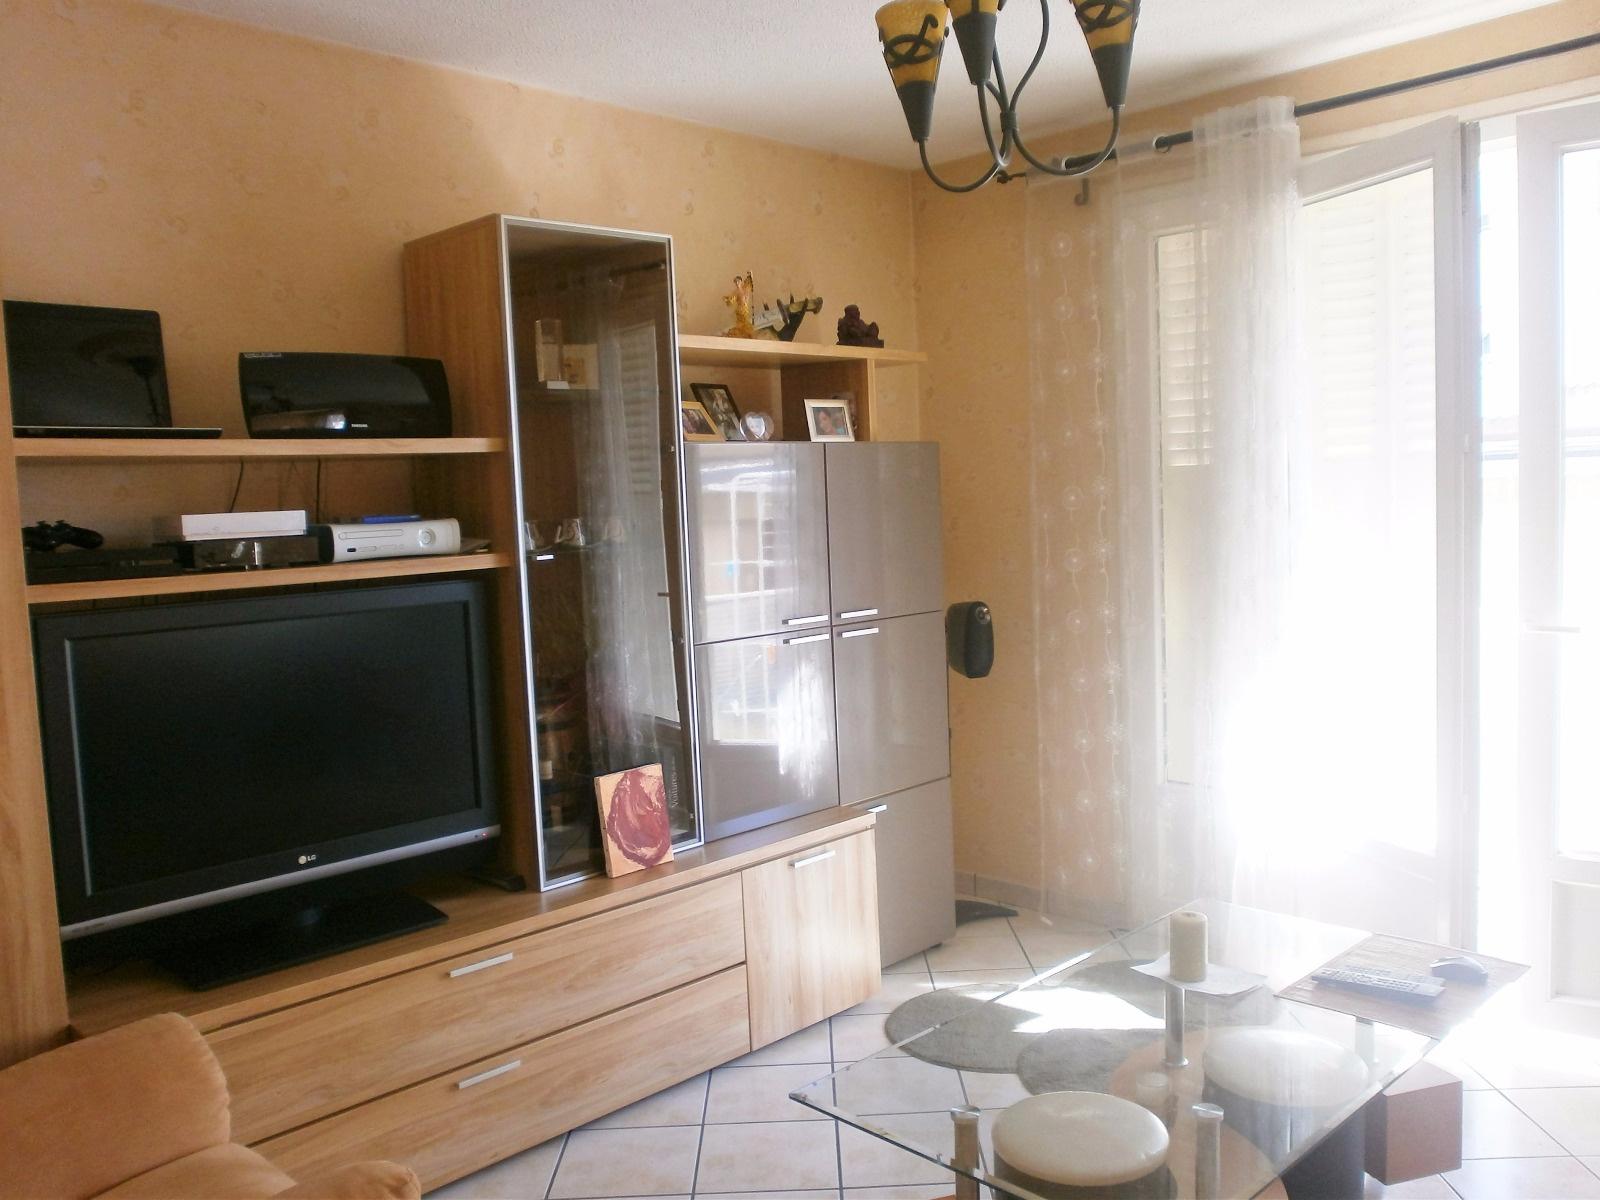 annonce vente appartement clermont ferrand 63000 67 m 128 000 992734451586. Black Bedroom Furniture Sets. Home Design Ideas